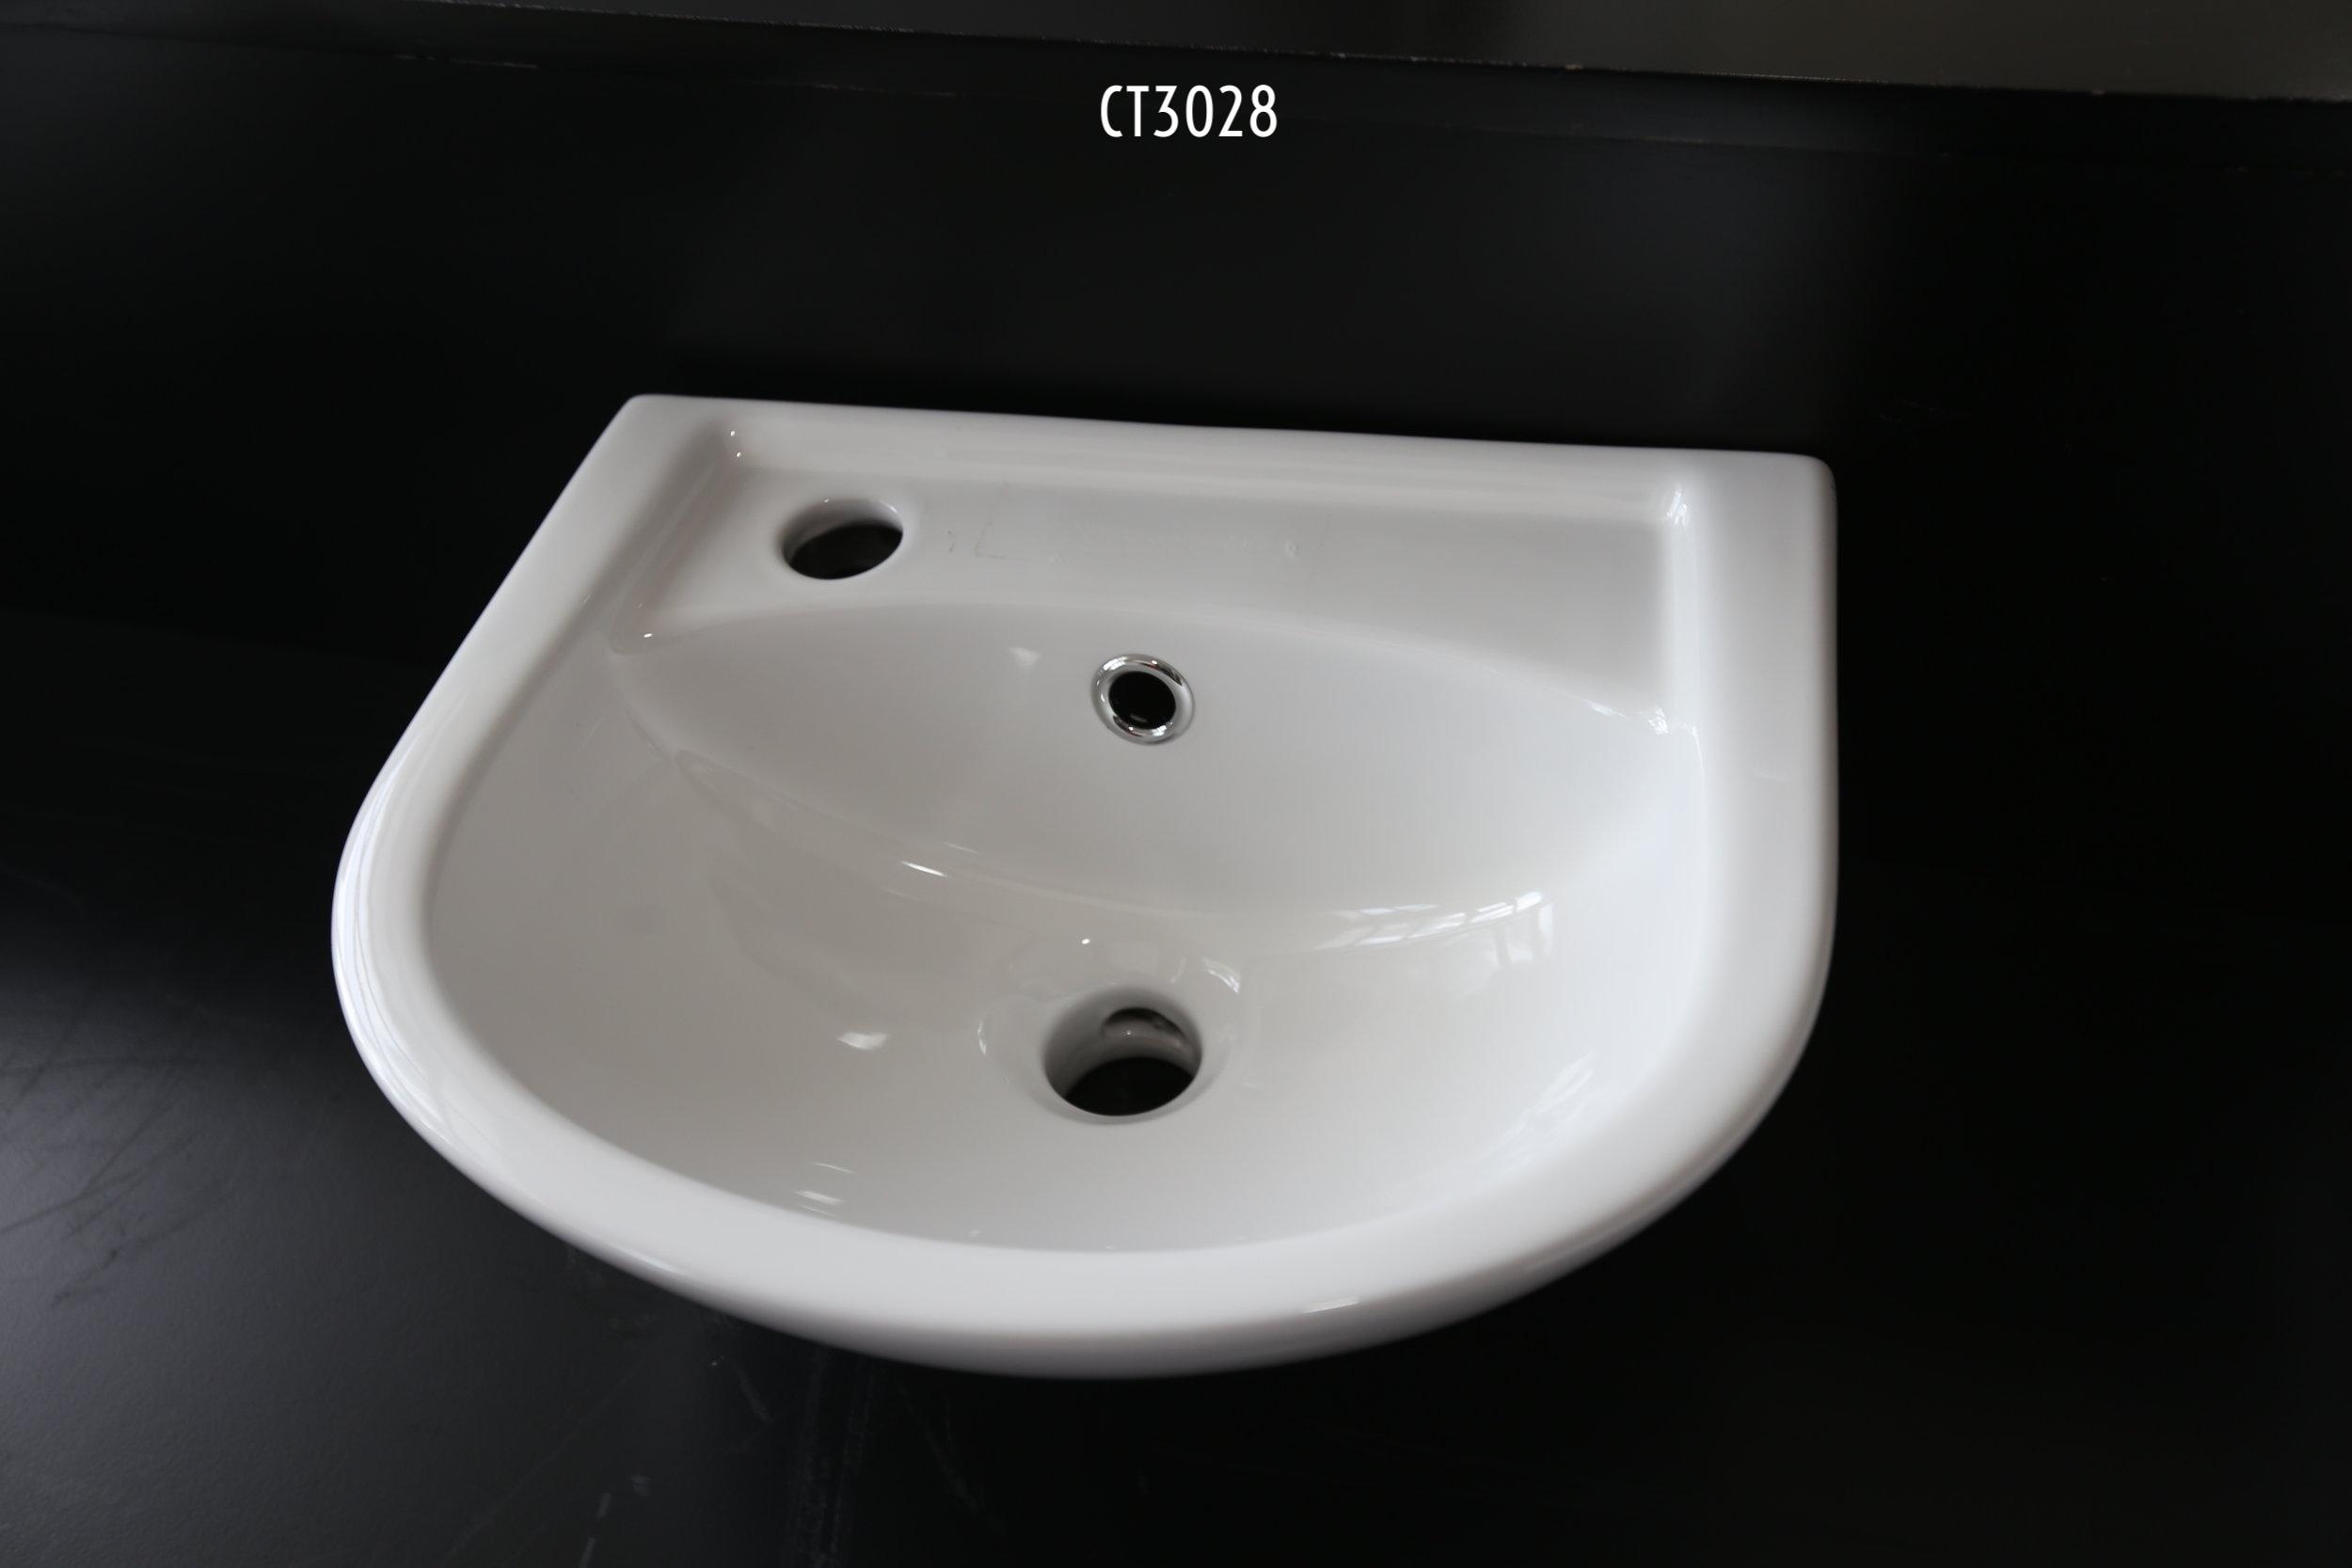 CT3028